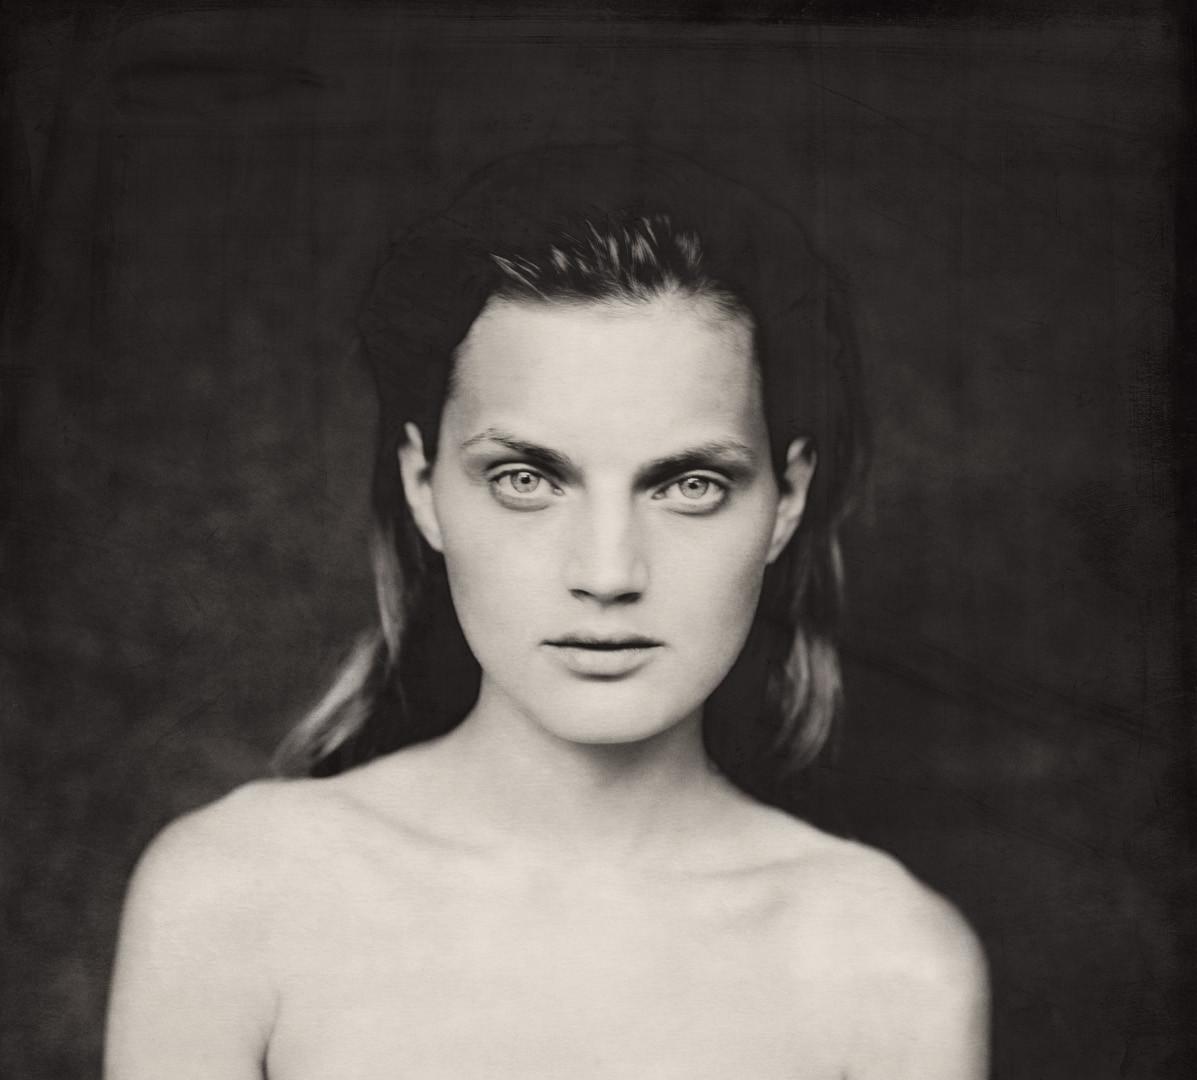 Paolo Roversi, Dark nude portrait of Guinevere I, Paris, 1996